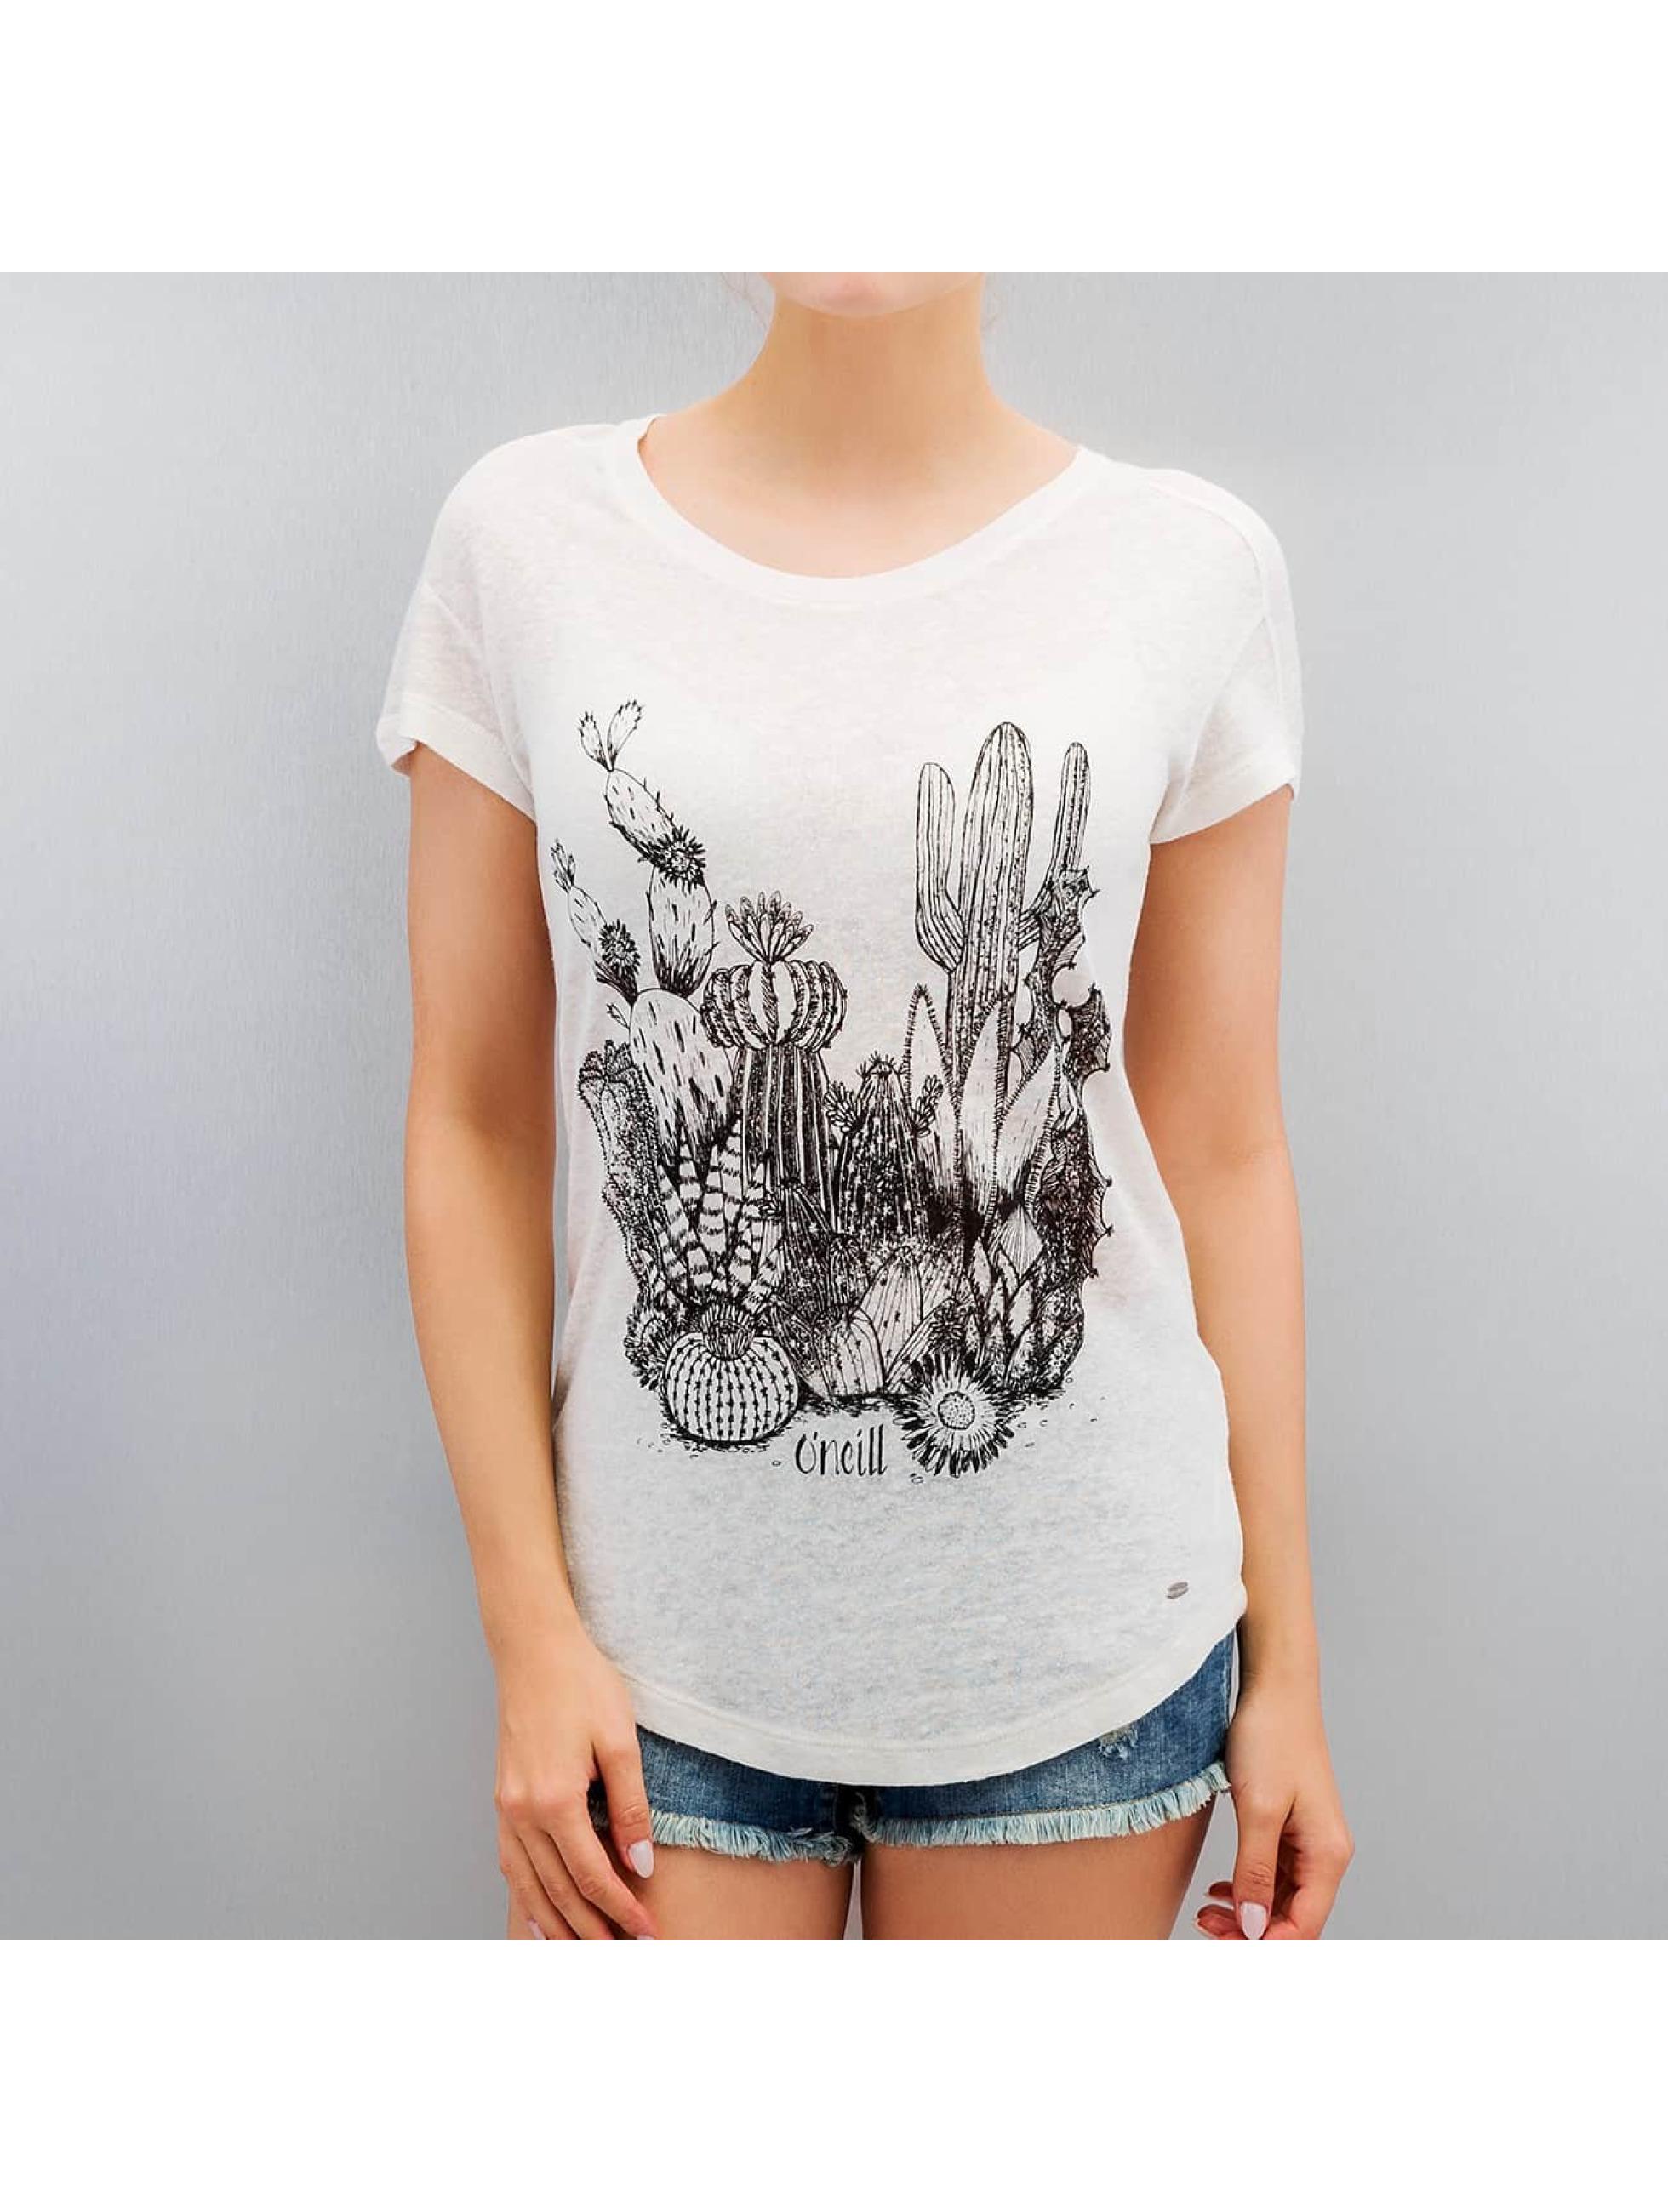 O'NEILL T-Shirt Cali Nature white